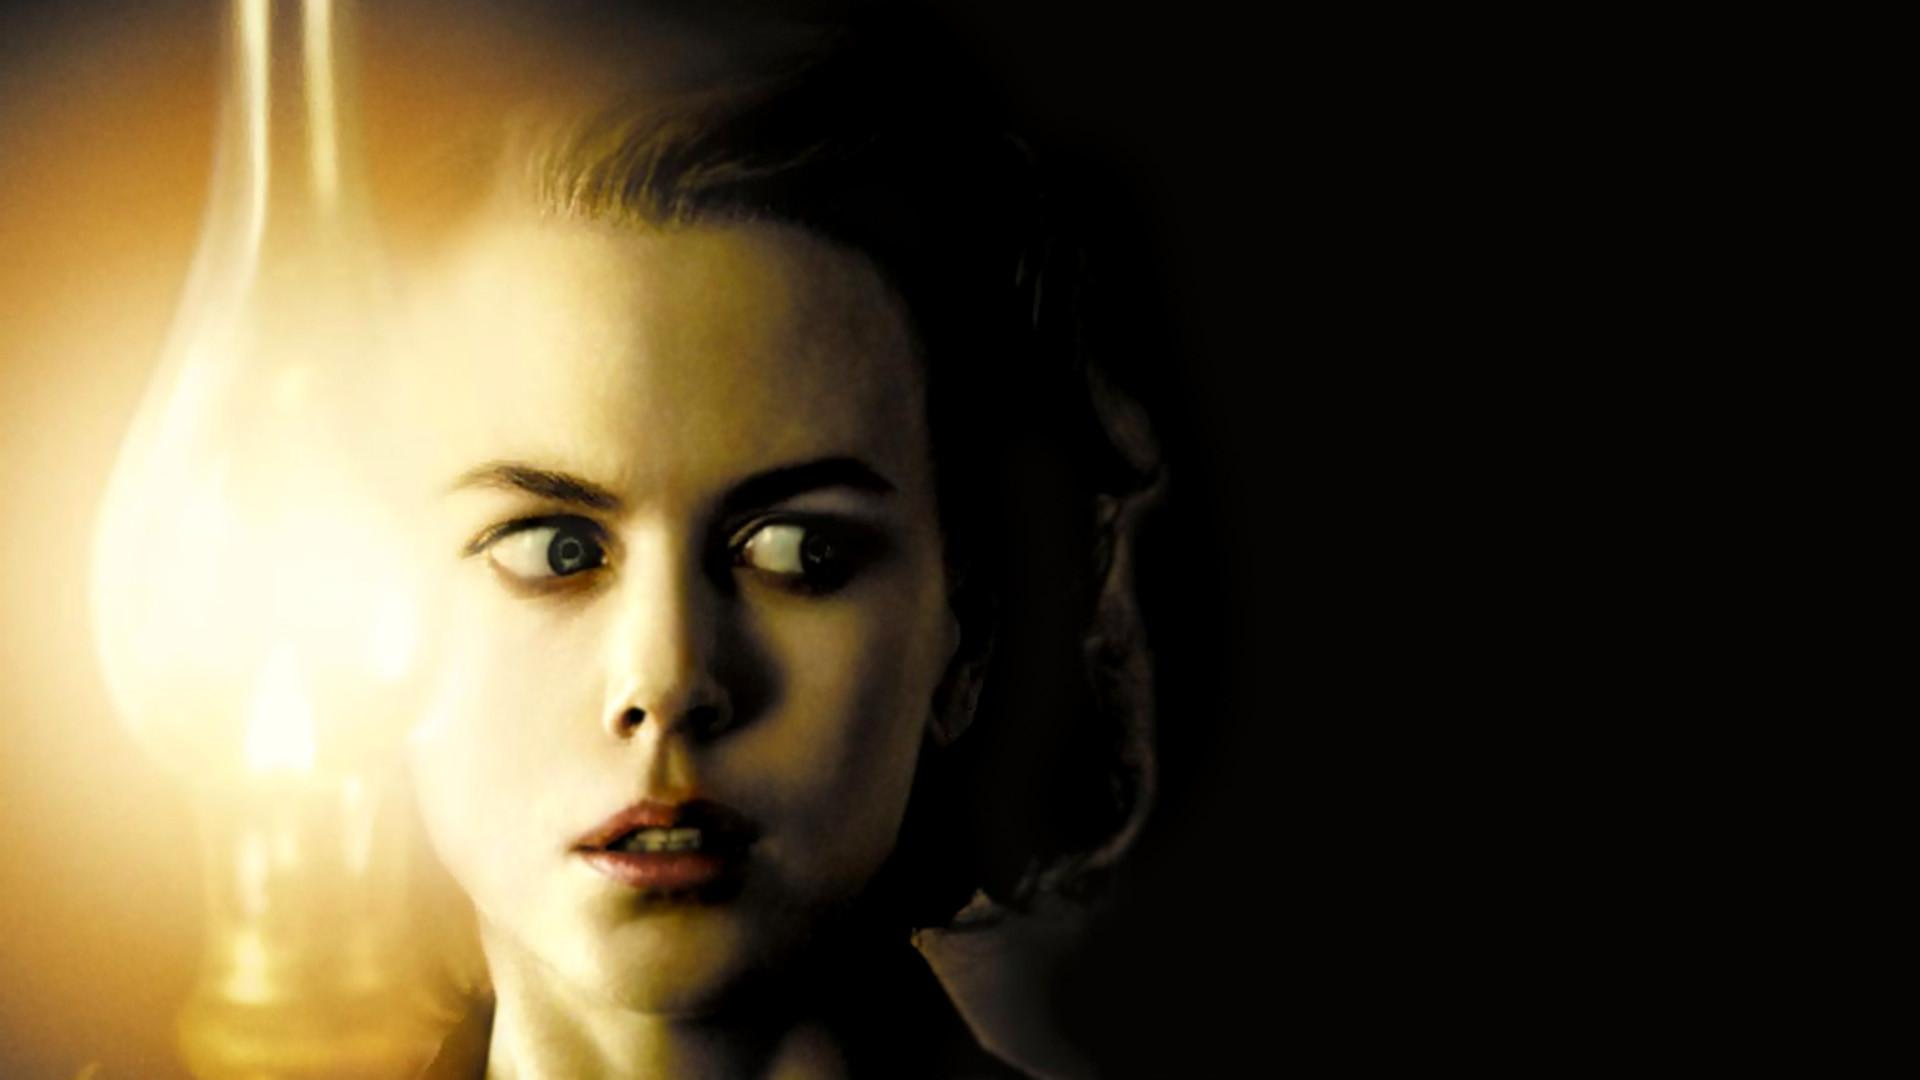 Scary Little Girl Wallpaper Shocktober Day 3 Mildly Pleased